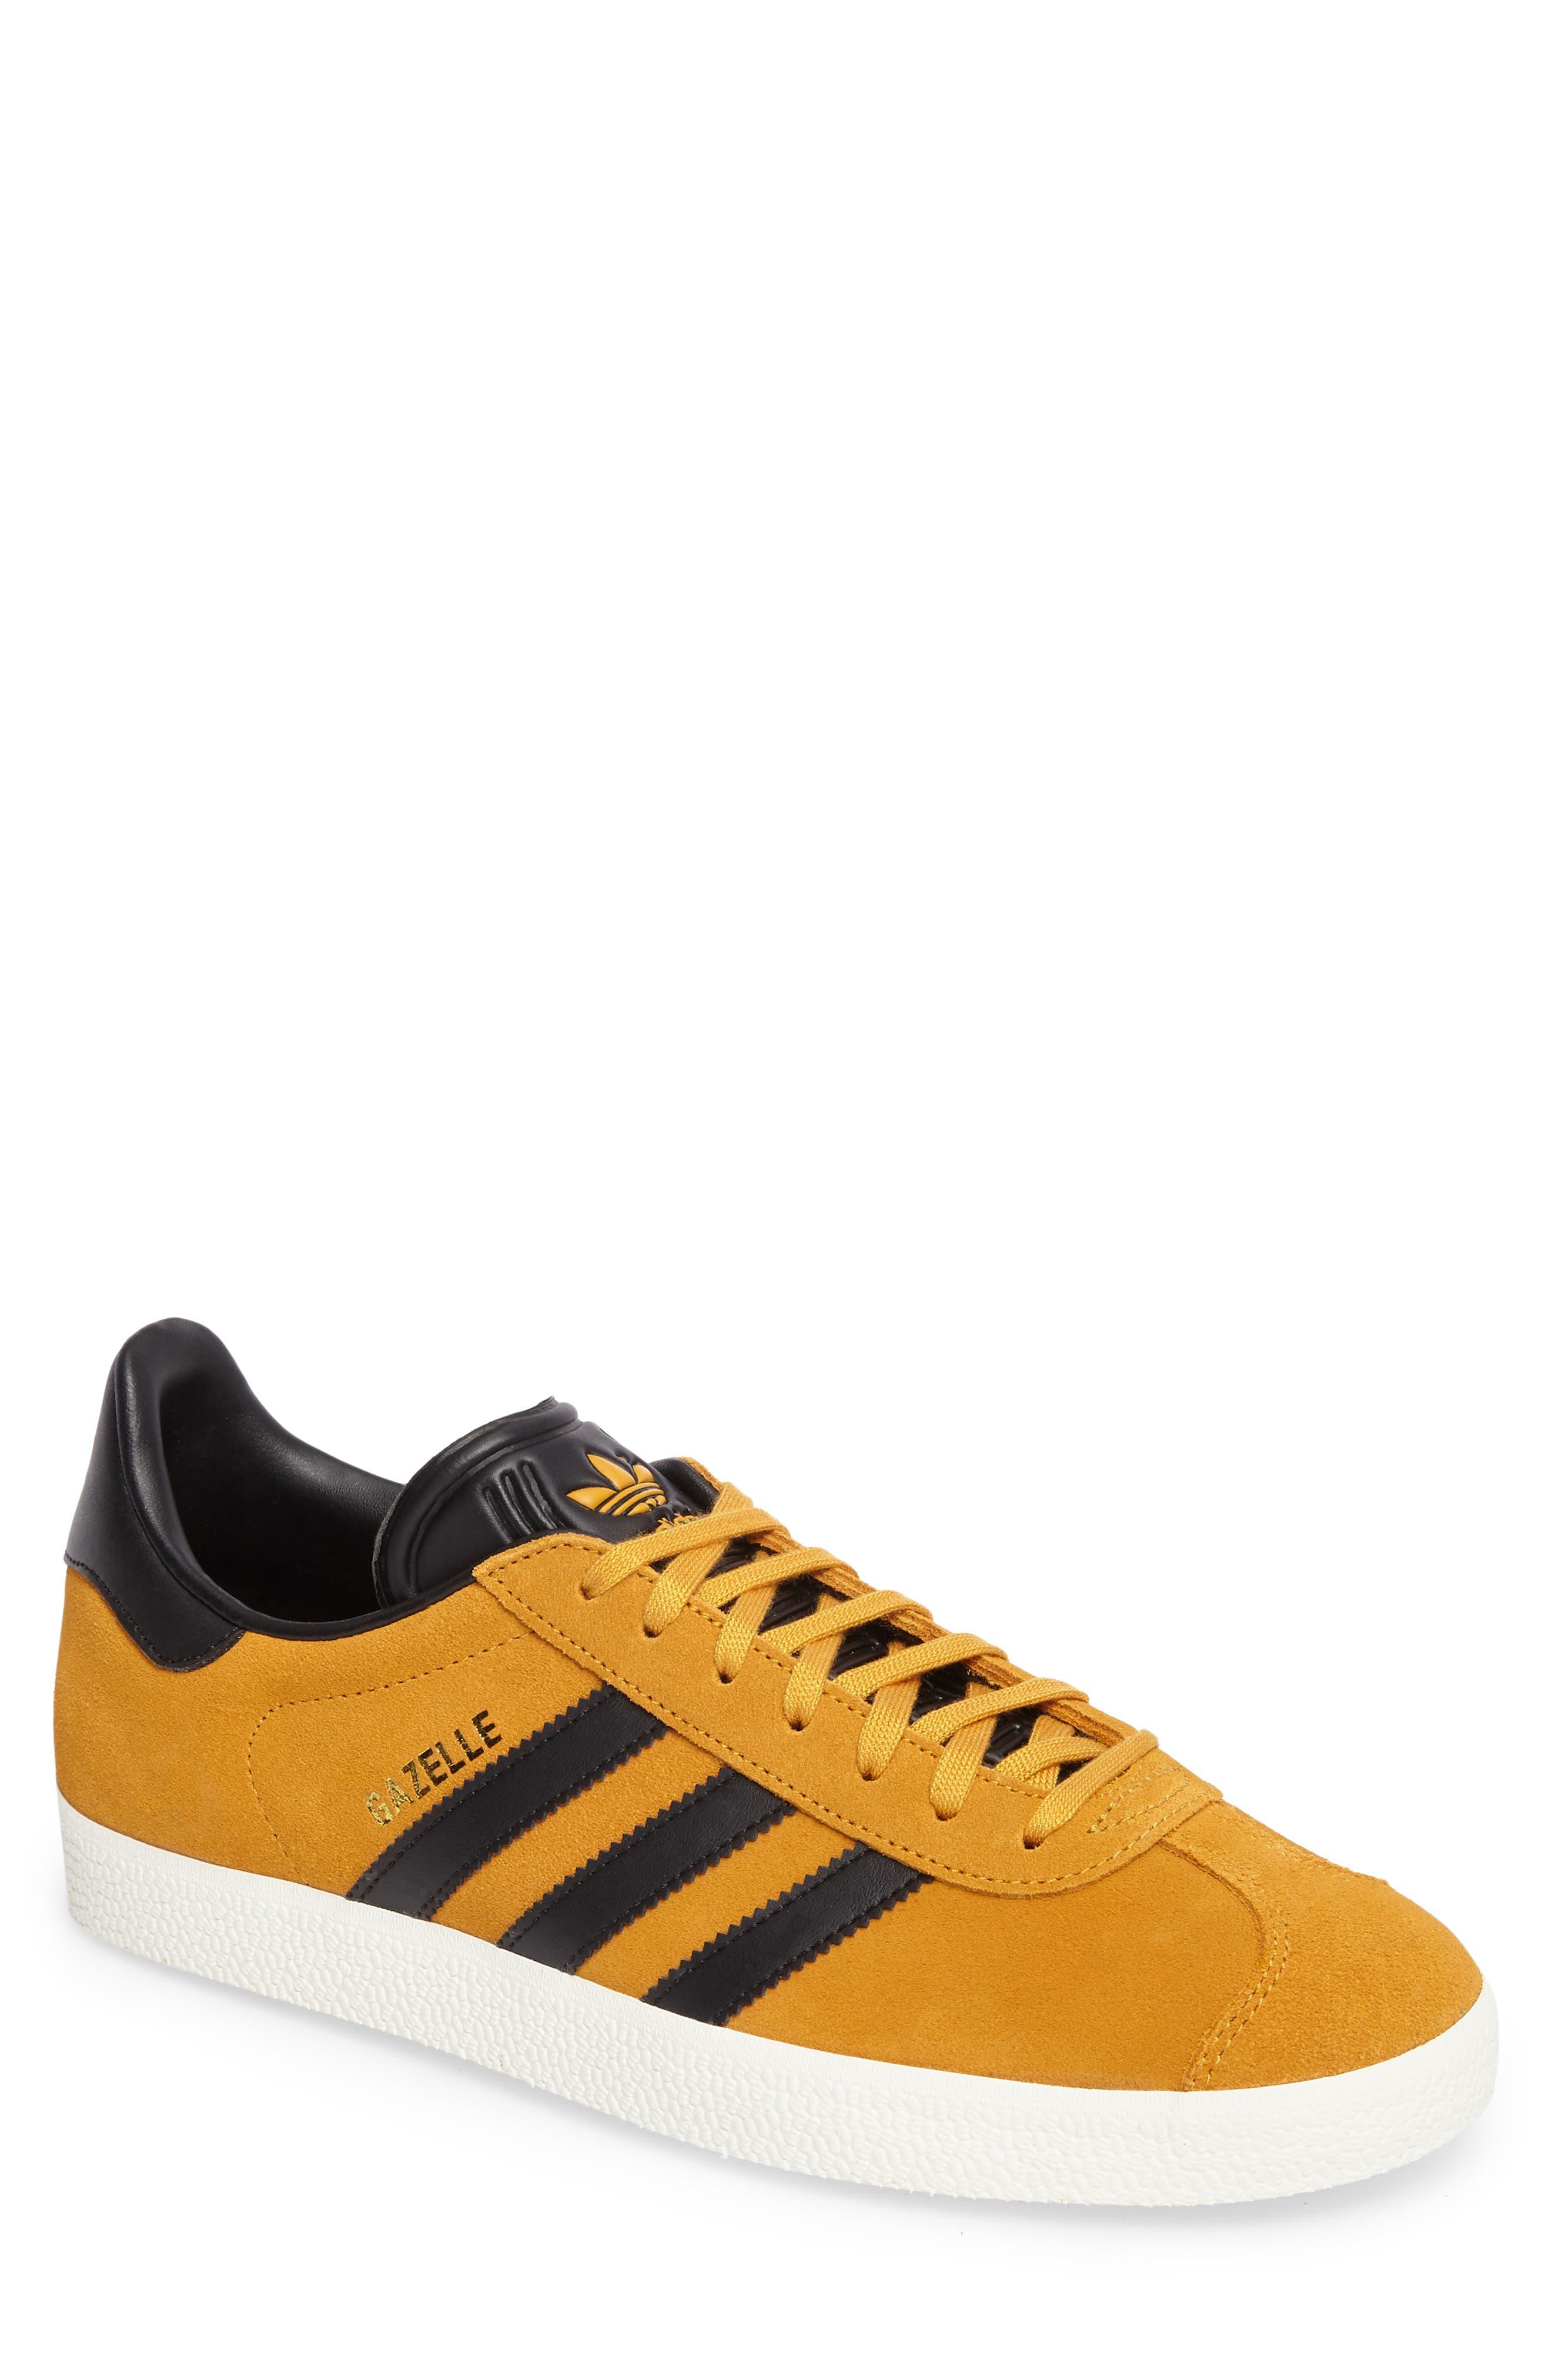 Gazelle Sneaker,                         Main,                         color, Yellow/ Core Black/ Gold